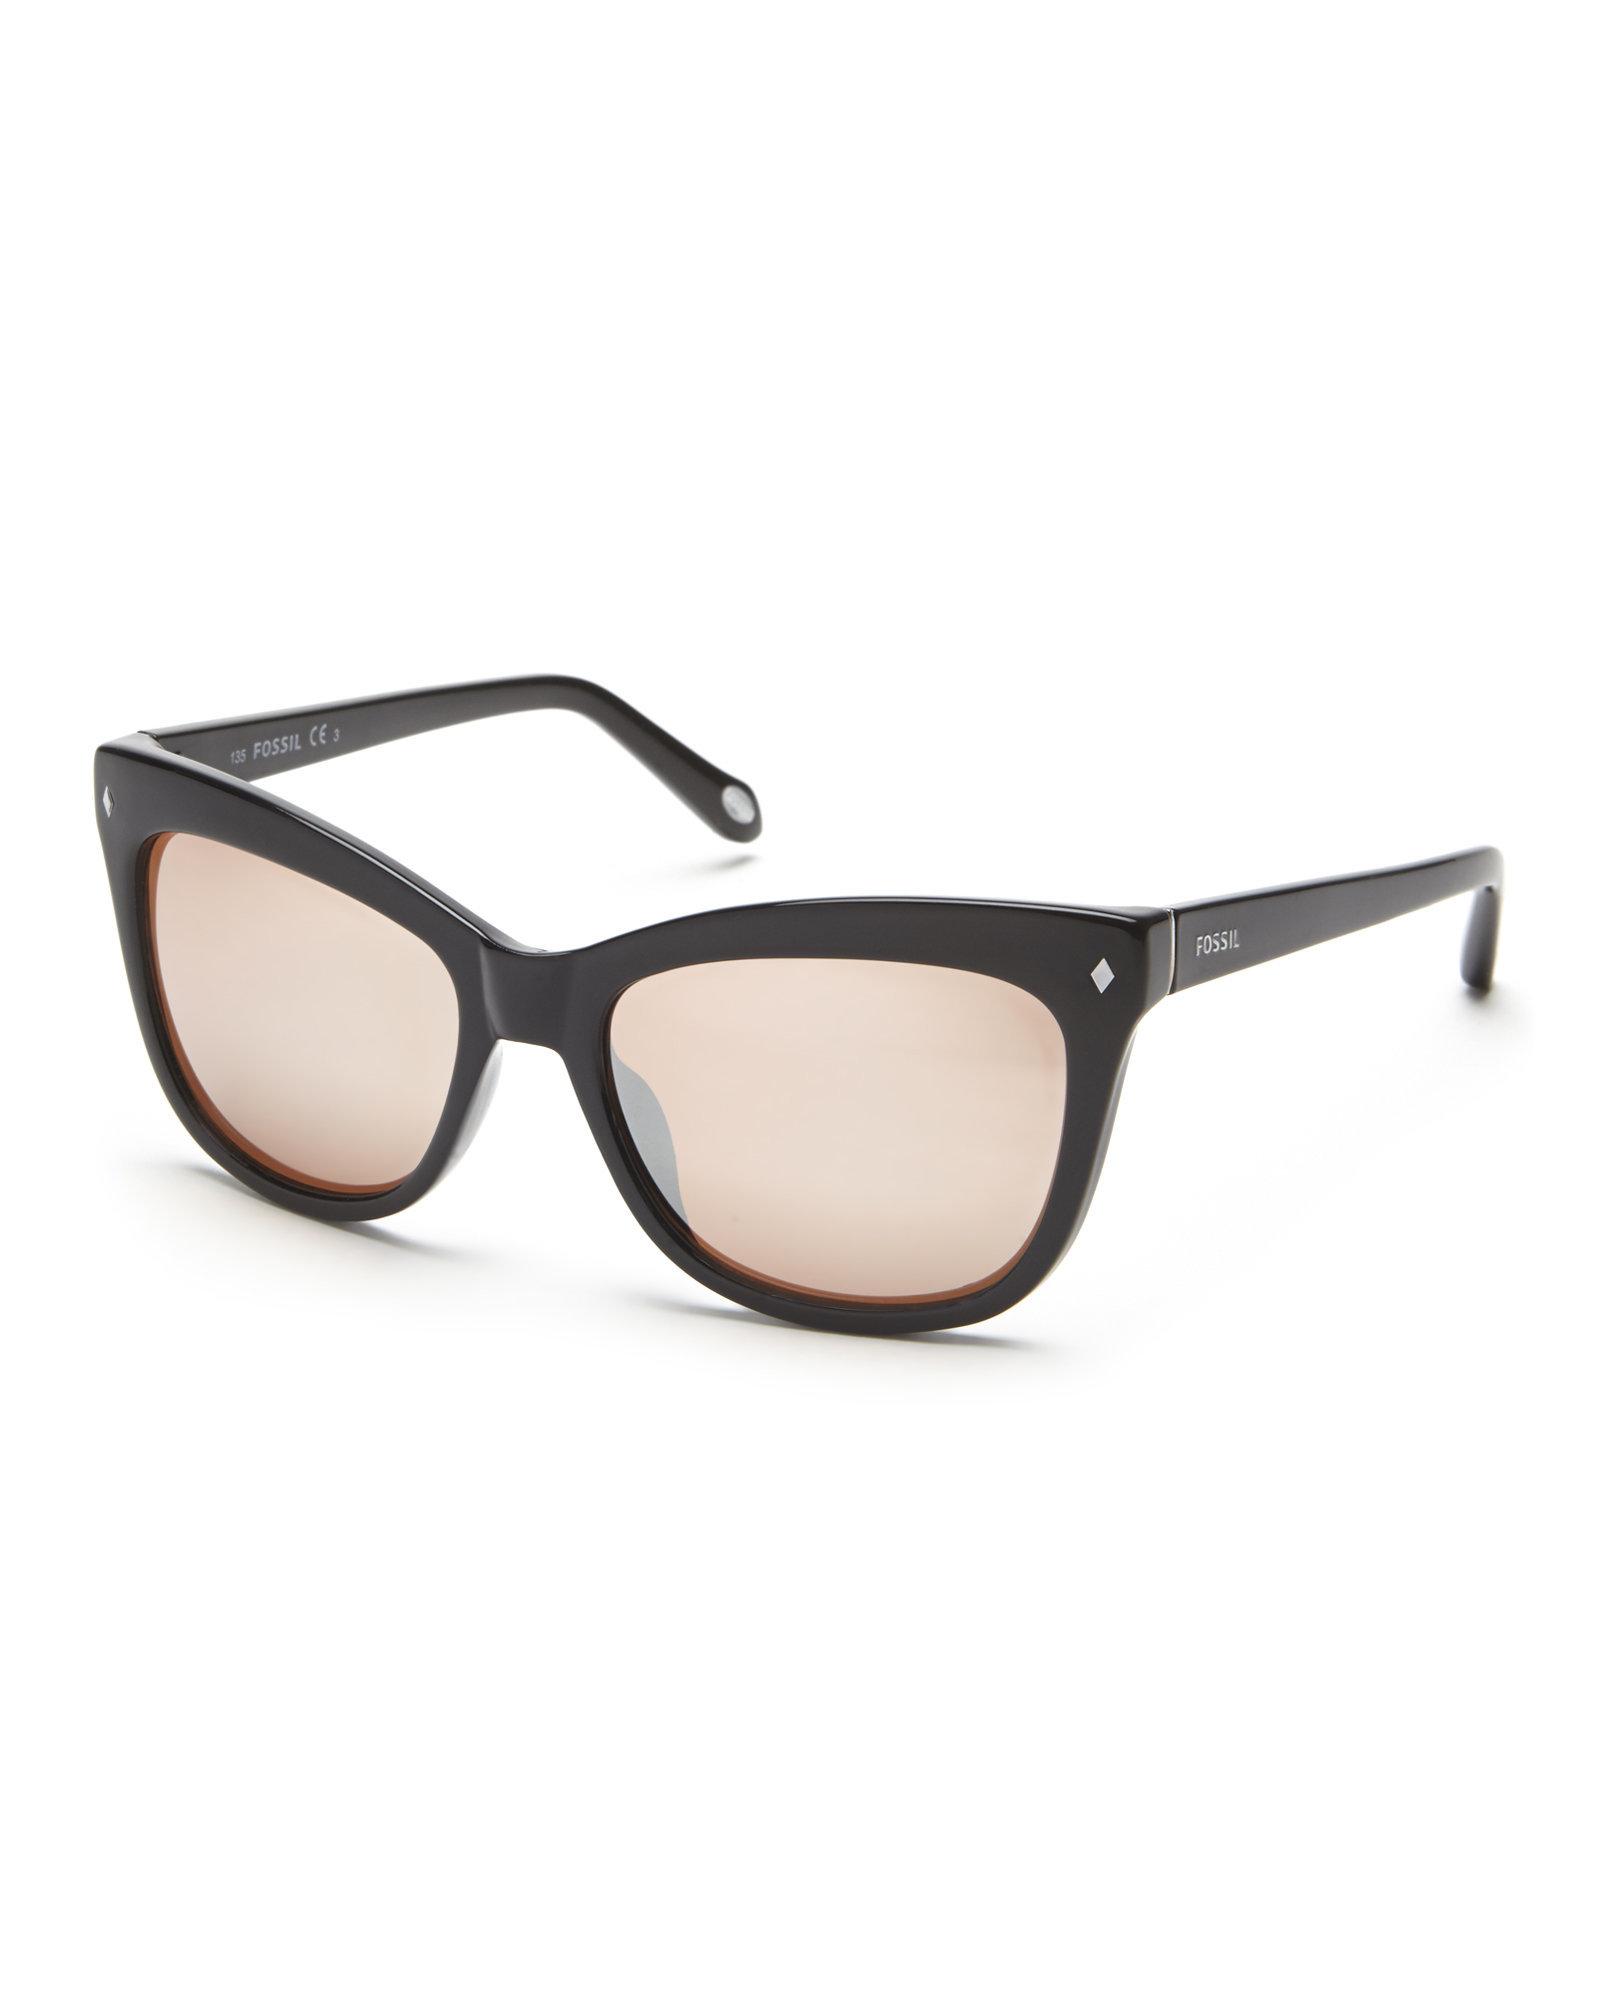 fossil sunglasses y2sj  Gallery